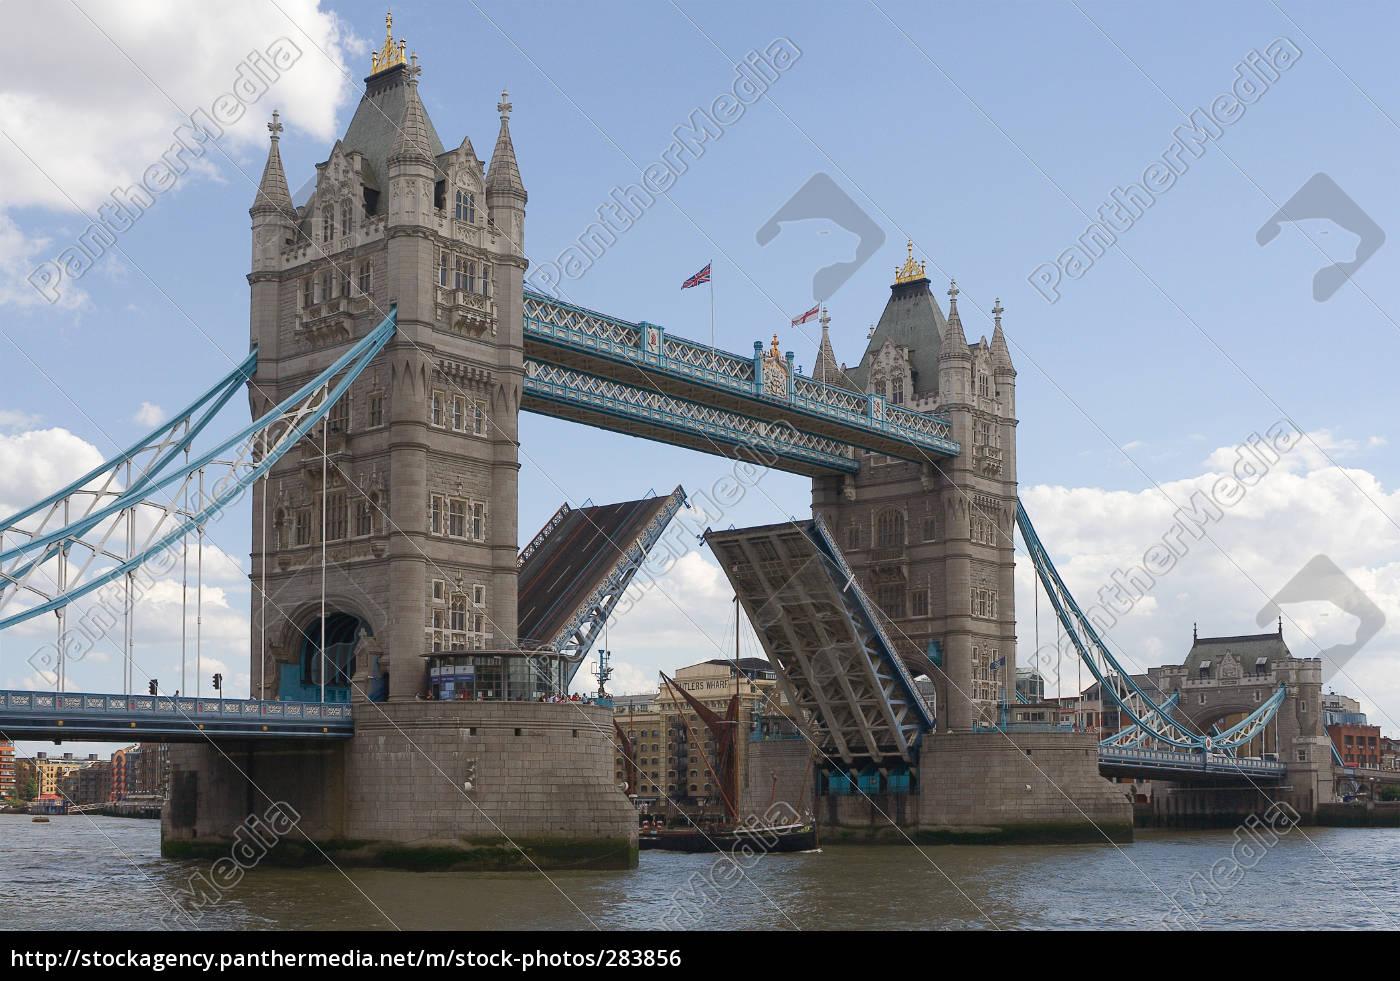 tower, bridge - 283856